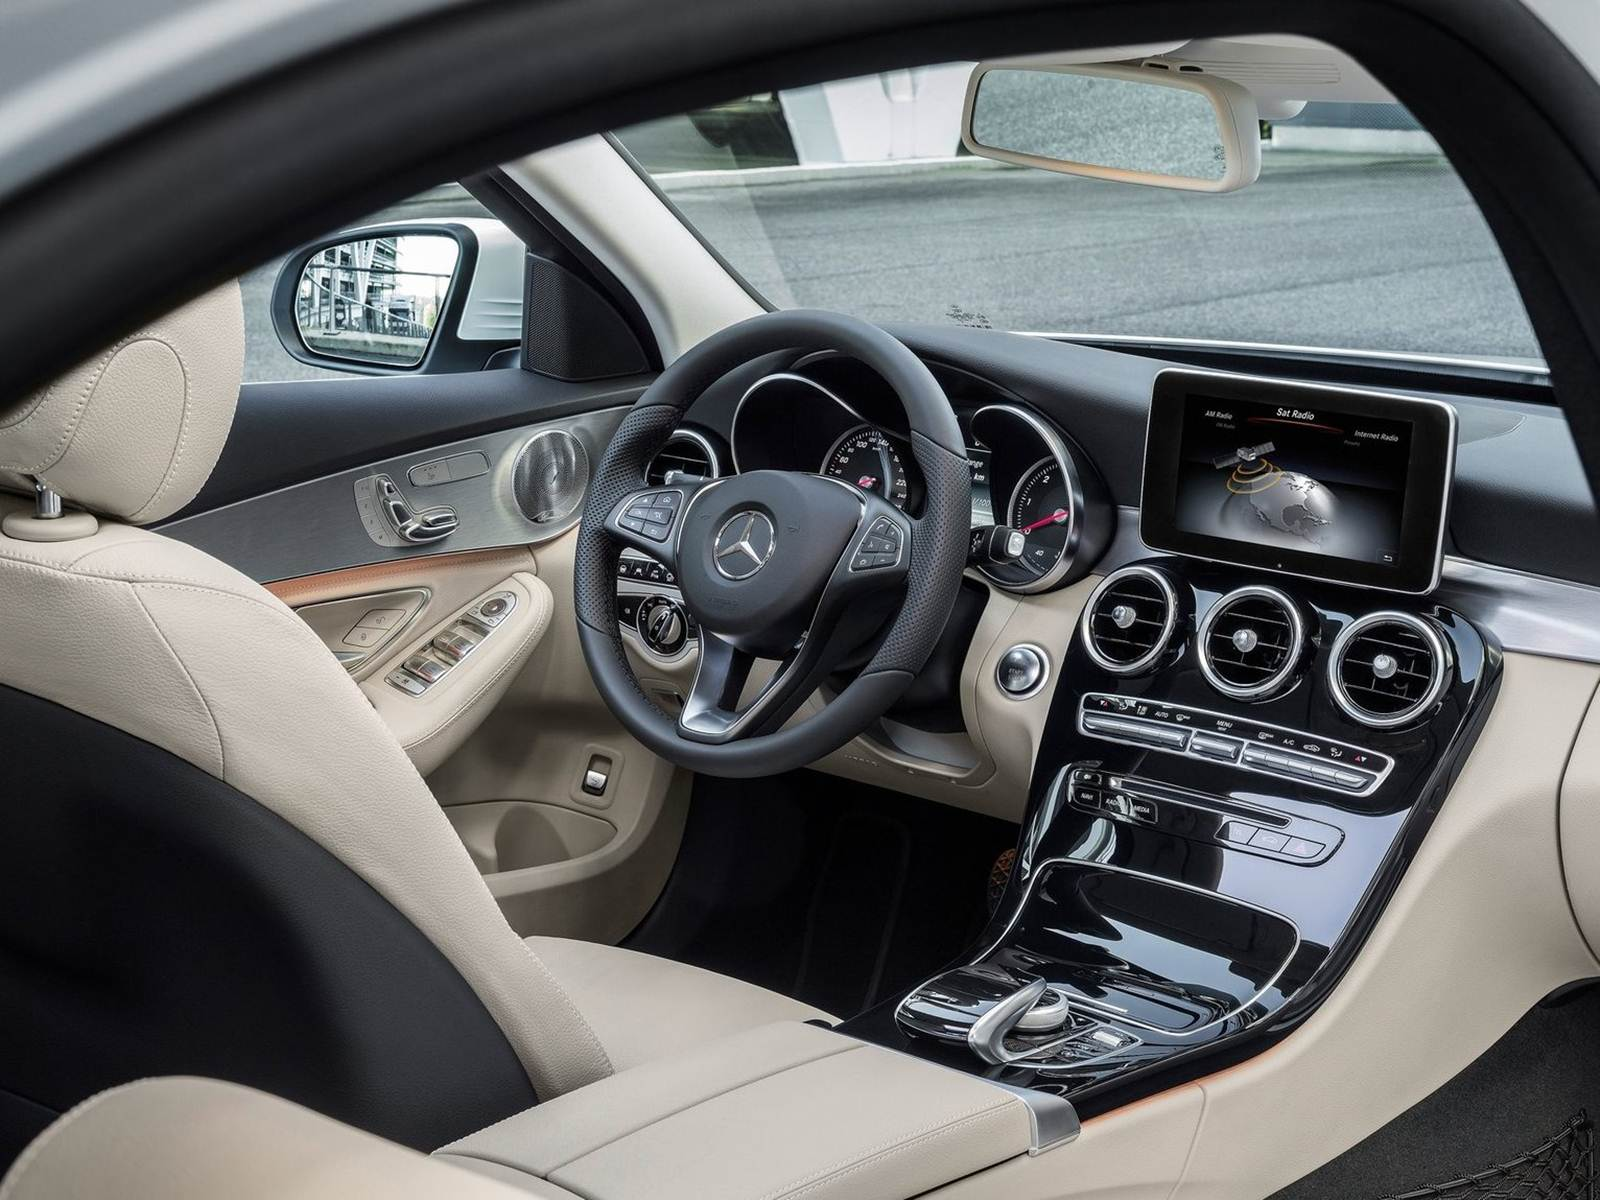 Mercedes benz classe c recebe motor renault na europa for Mercedes benz c class 2015 interior